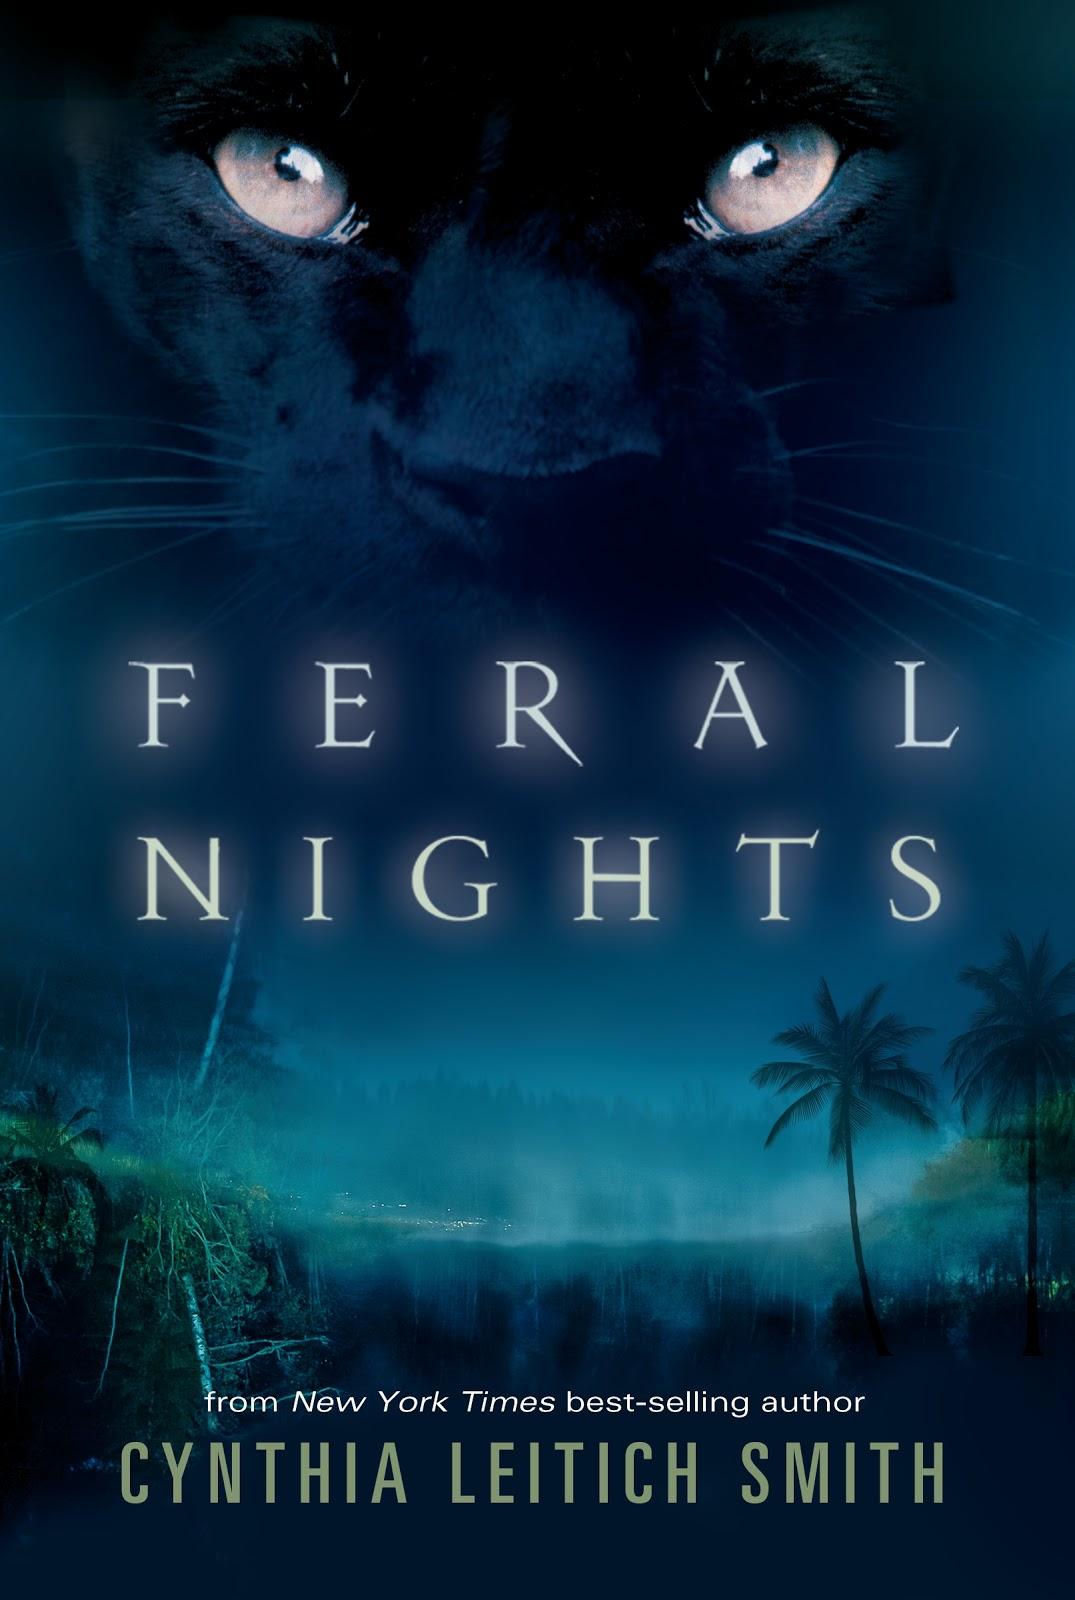 http://3.bp.blogspot.com/-3ZWMI_3T754/UJpqqJy7x_I/AAAAAAAAfDI/JPSQlagT0OI/s1600/Feral+Nights+Final.jpg